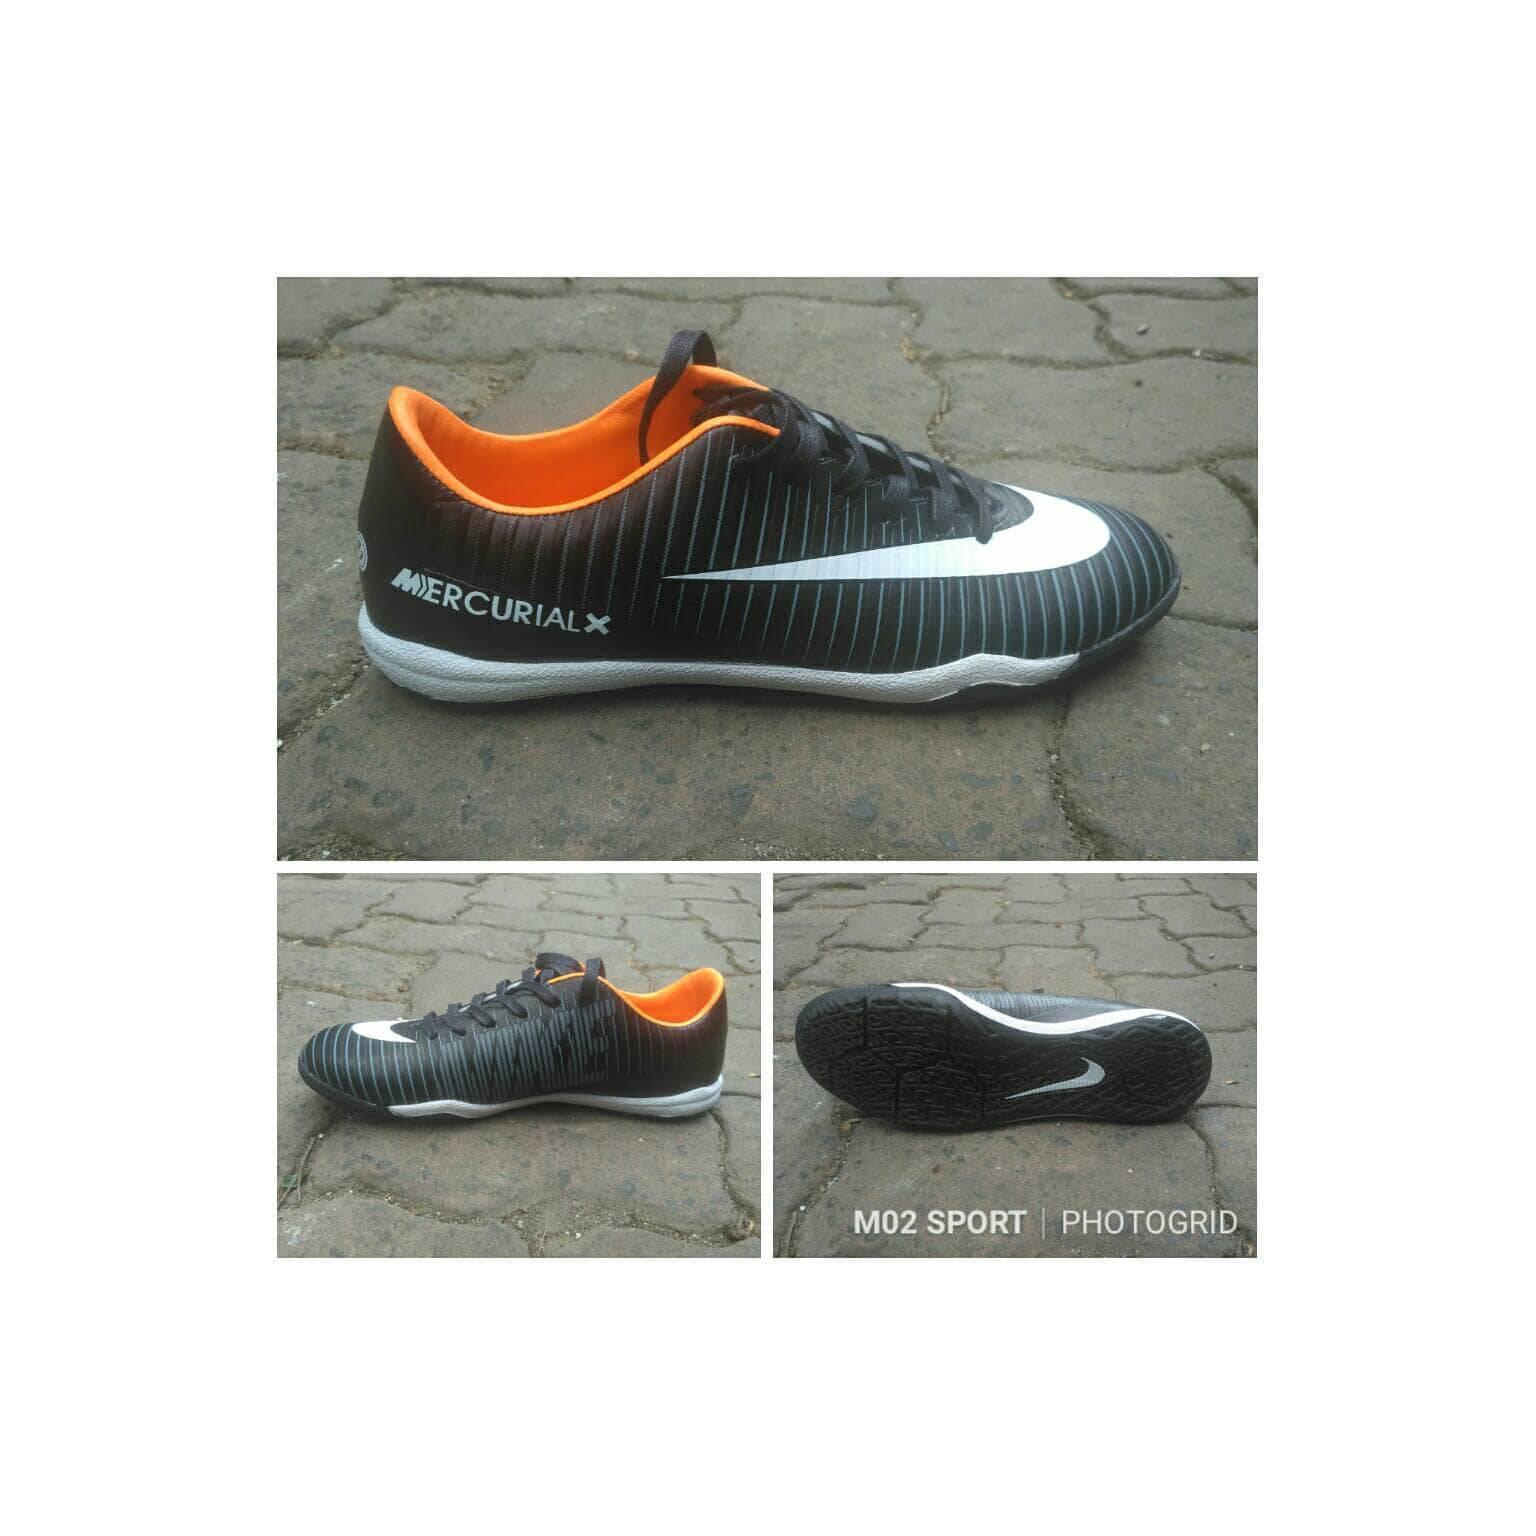 Sepatu futsal nike mercurial X hitam list putih sol karet